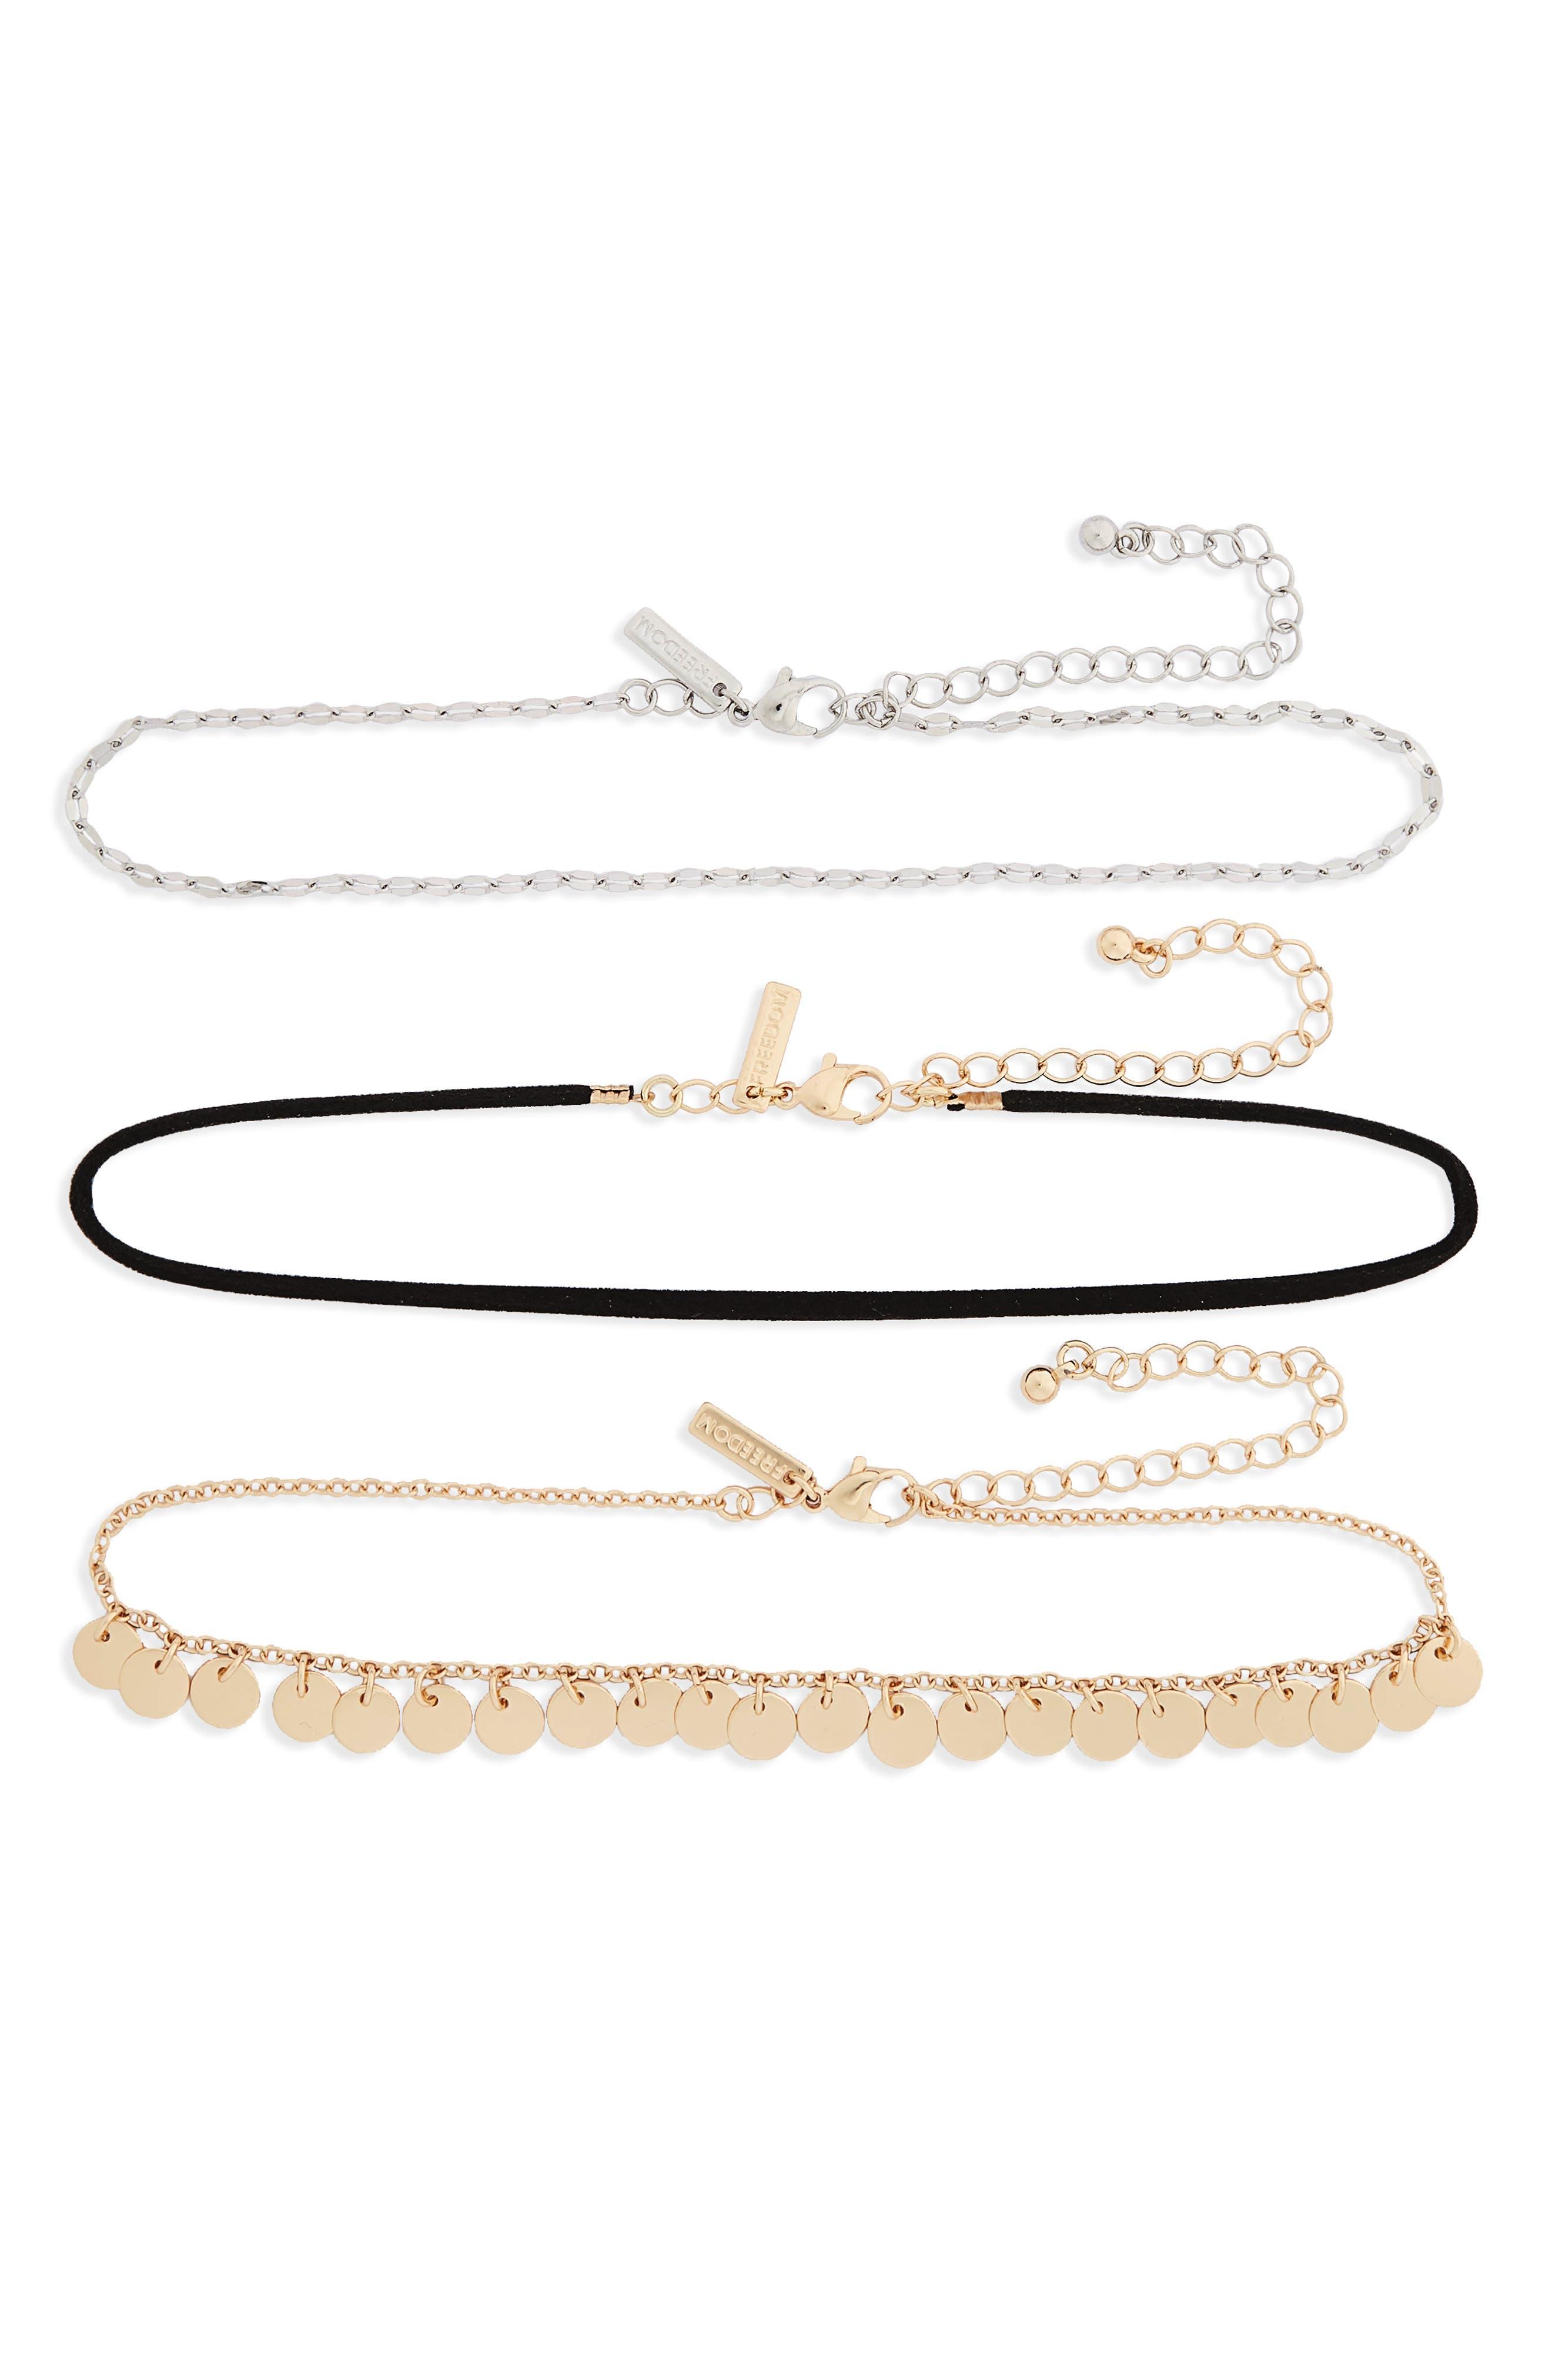 3-Pack Choker Necklaces,                             Main thumbnail 1, color,                             710